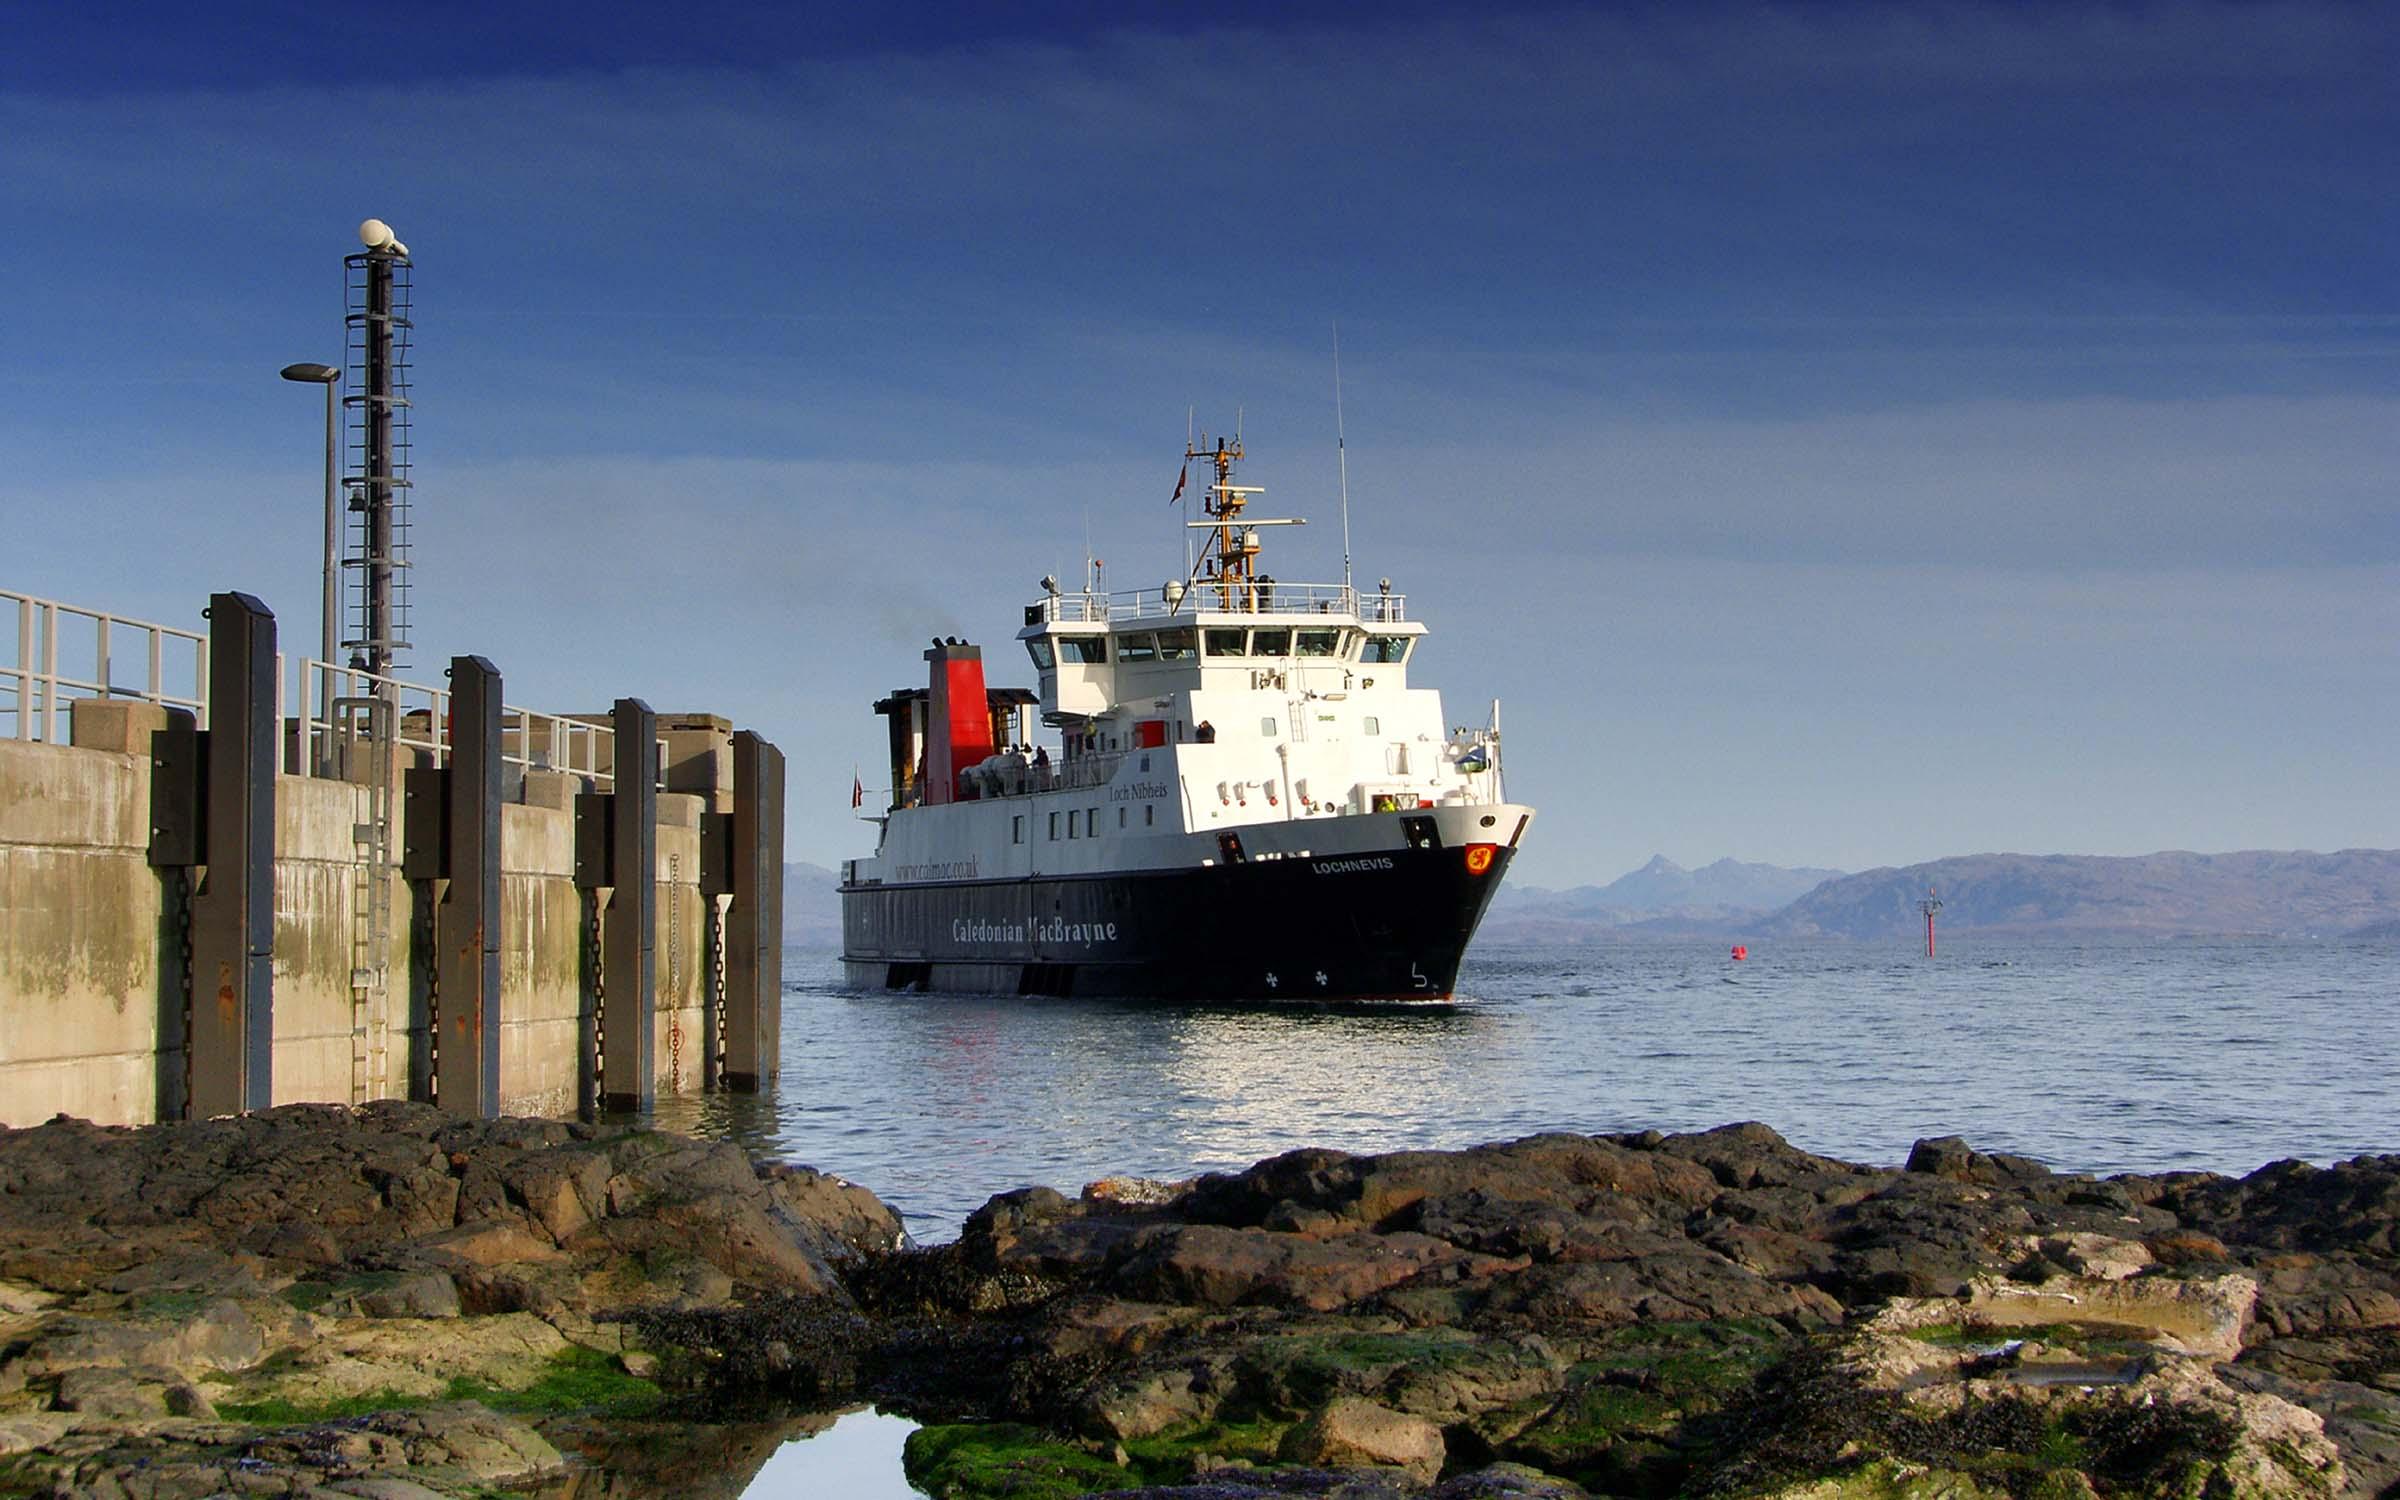 Lochnevis arriving at Eigg (Ships of CalMac)